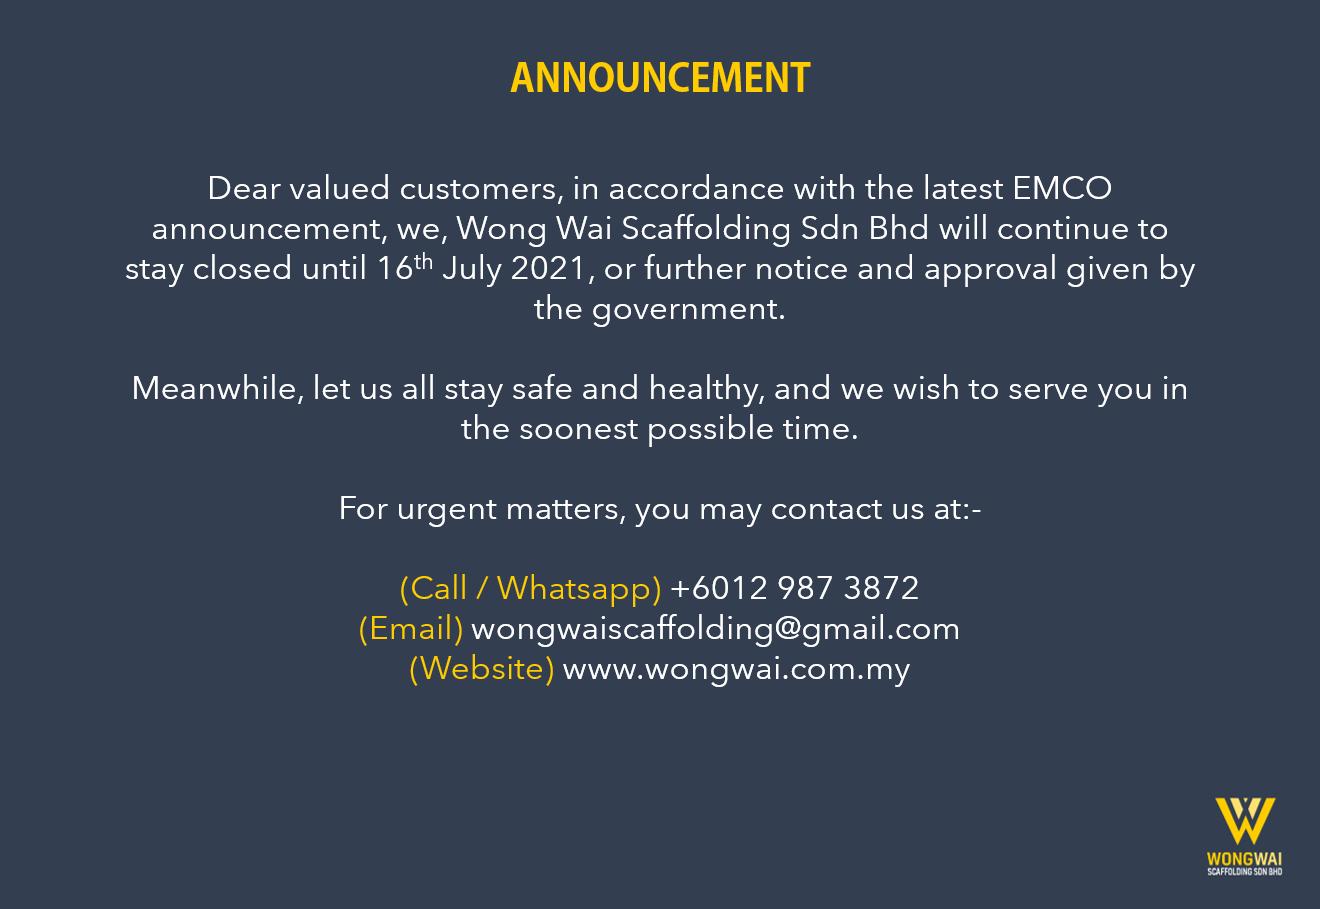 Wong Wai Scaffolding Sdn Bhd